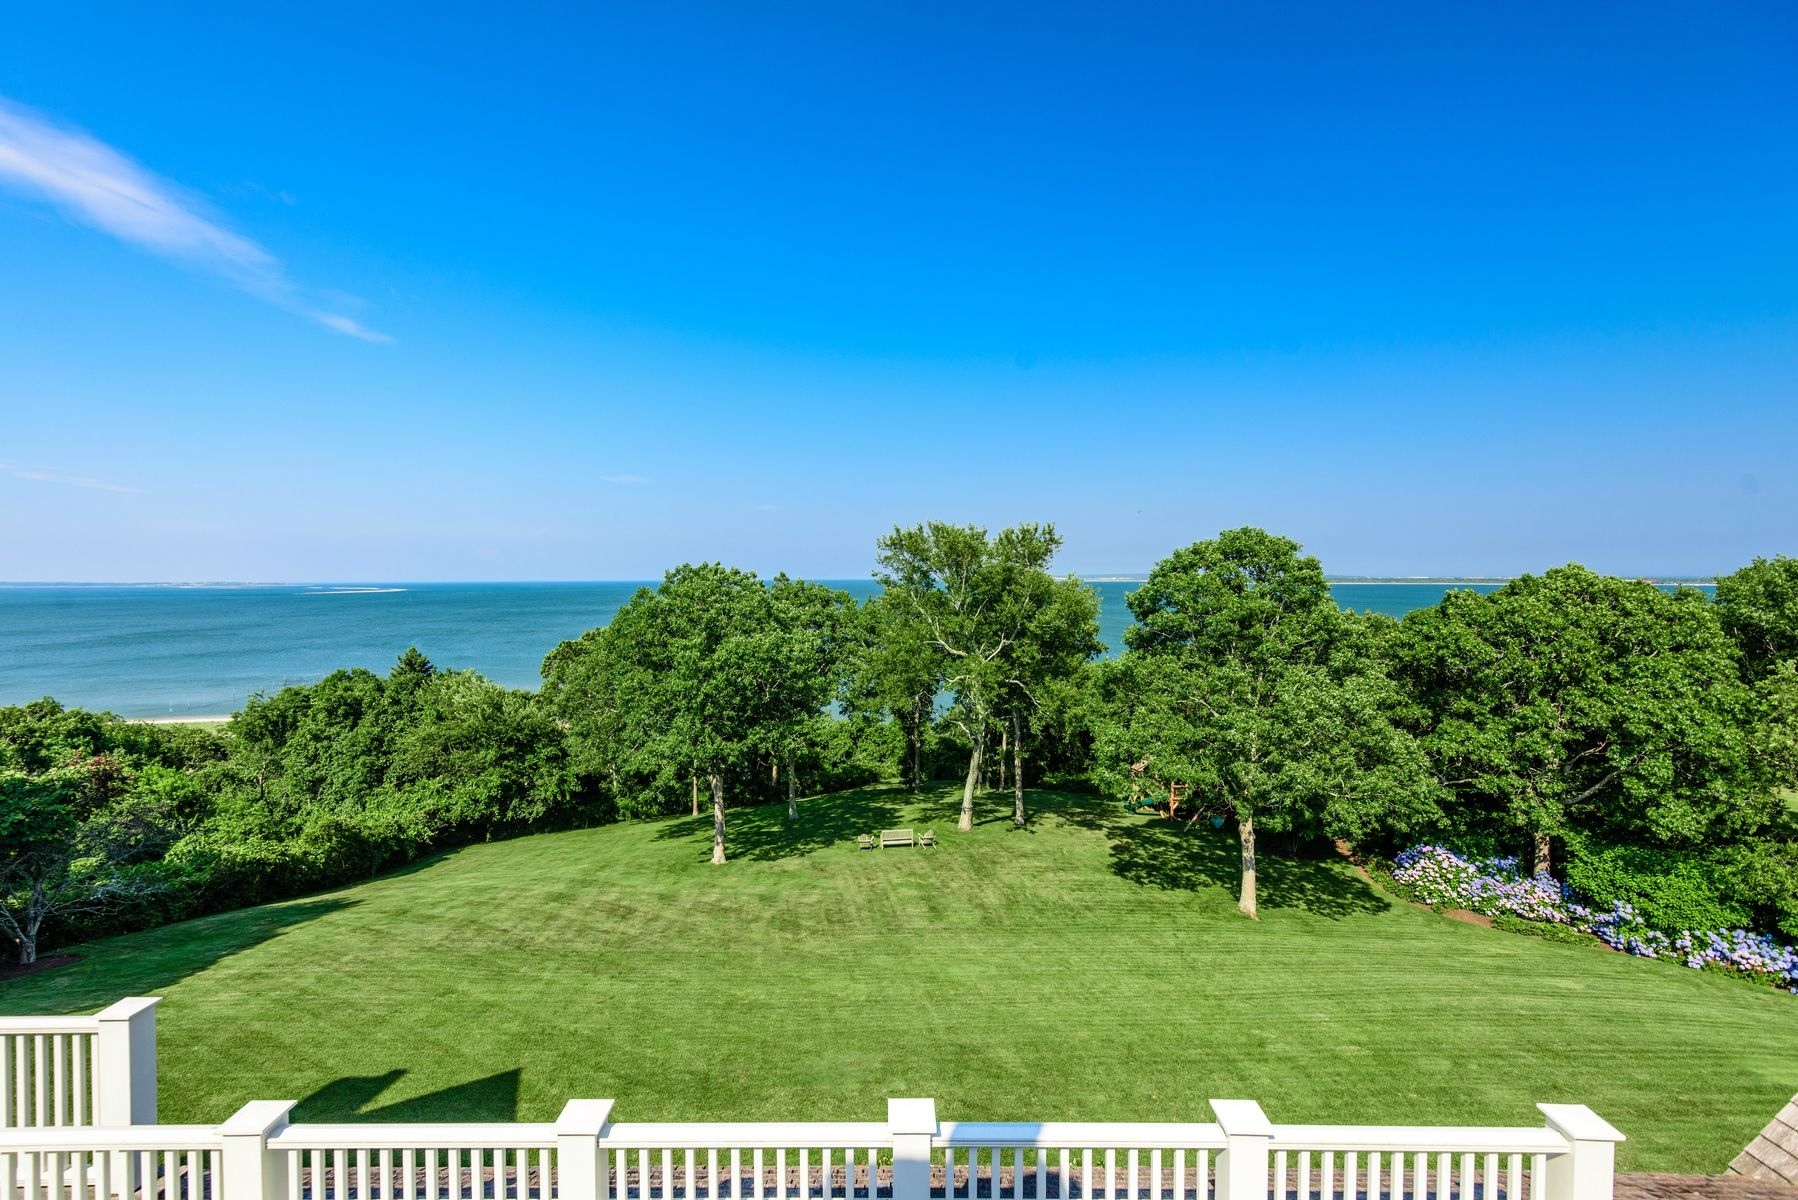 harvey weinstein lists hamptons home yard